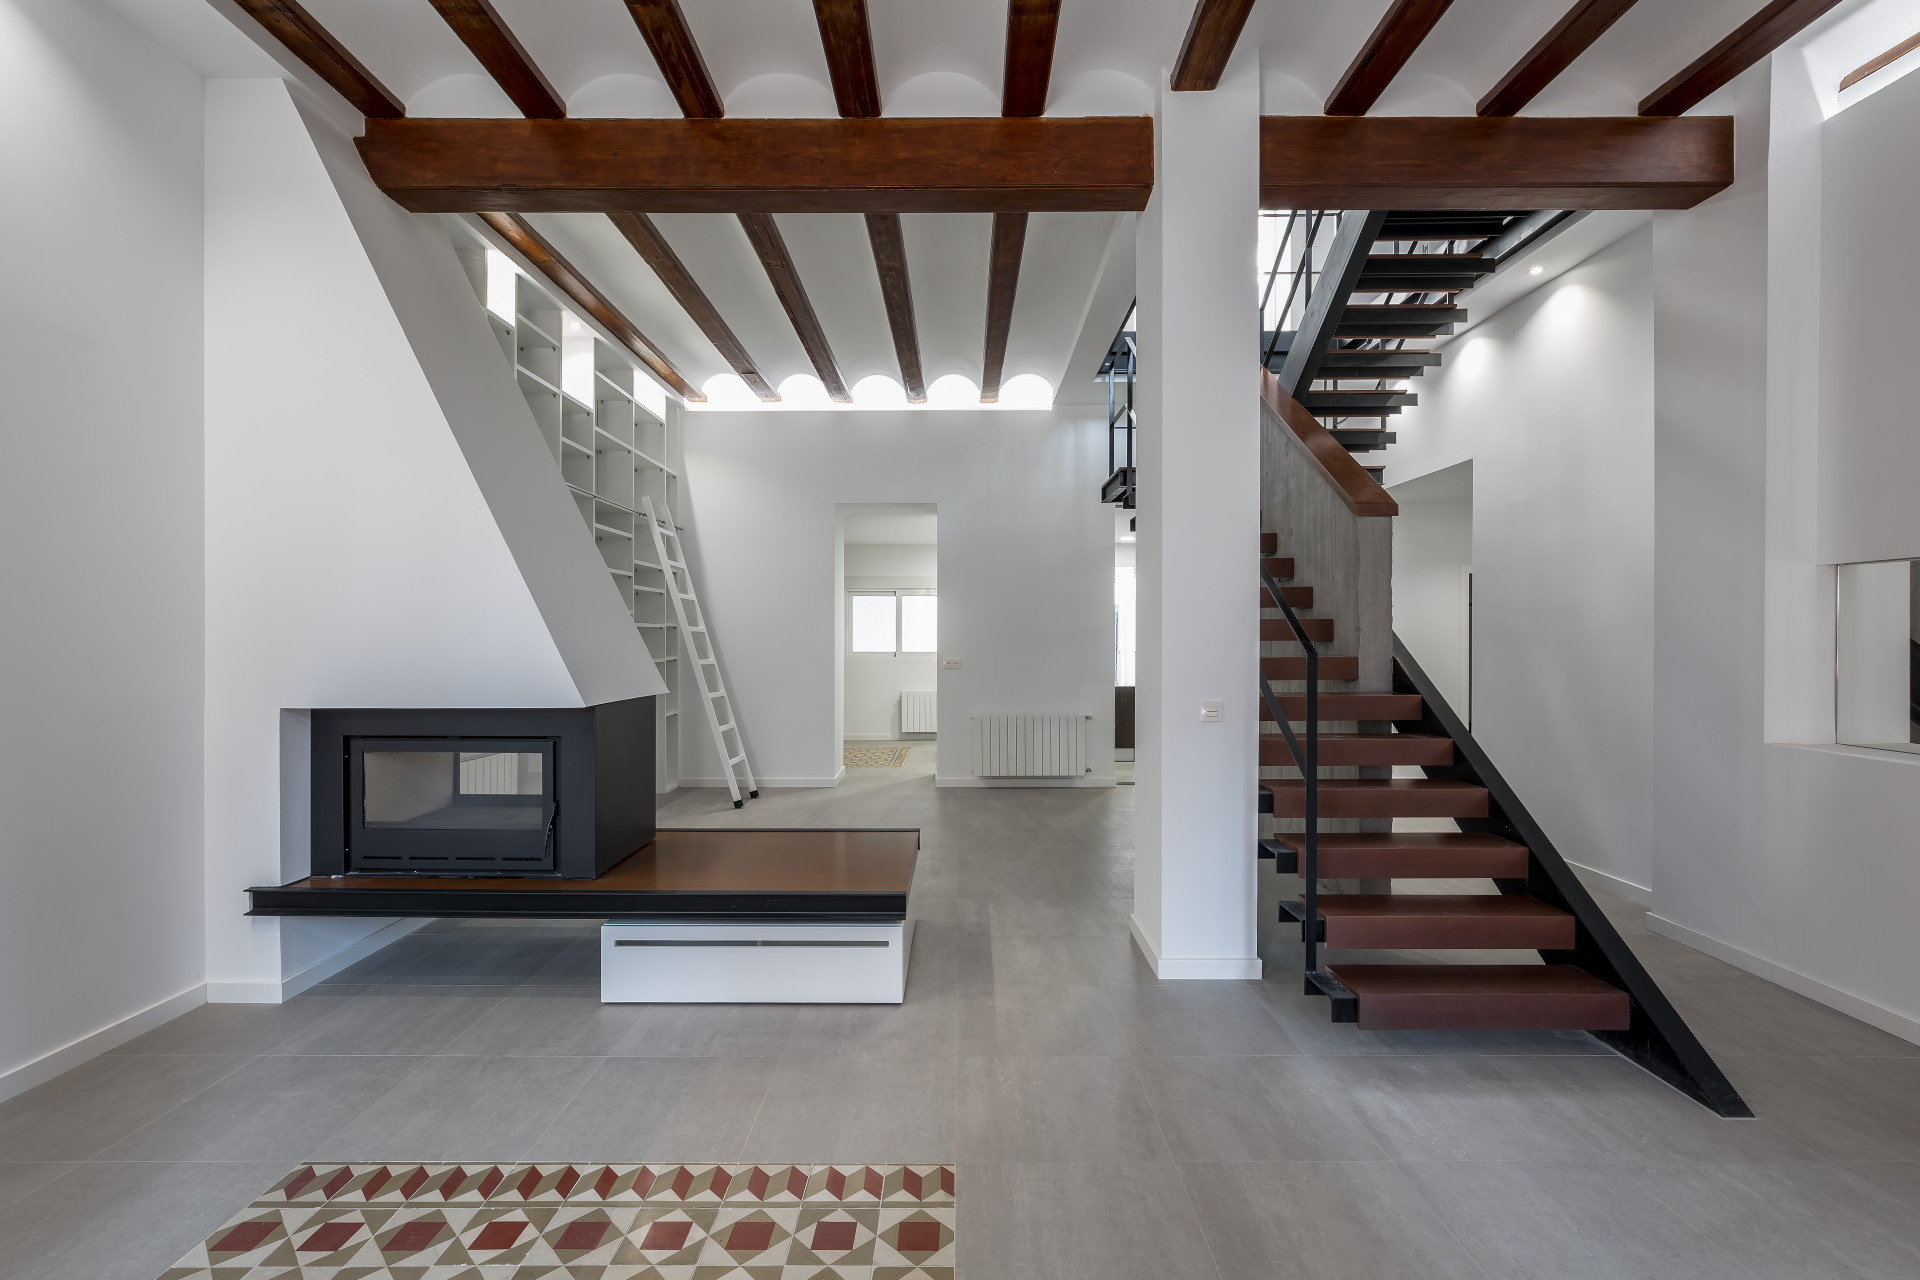 fotografia-arquitectura-valencia-german-cabo-viraje-rehabilitacion-campanar (2)